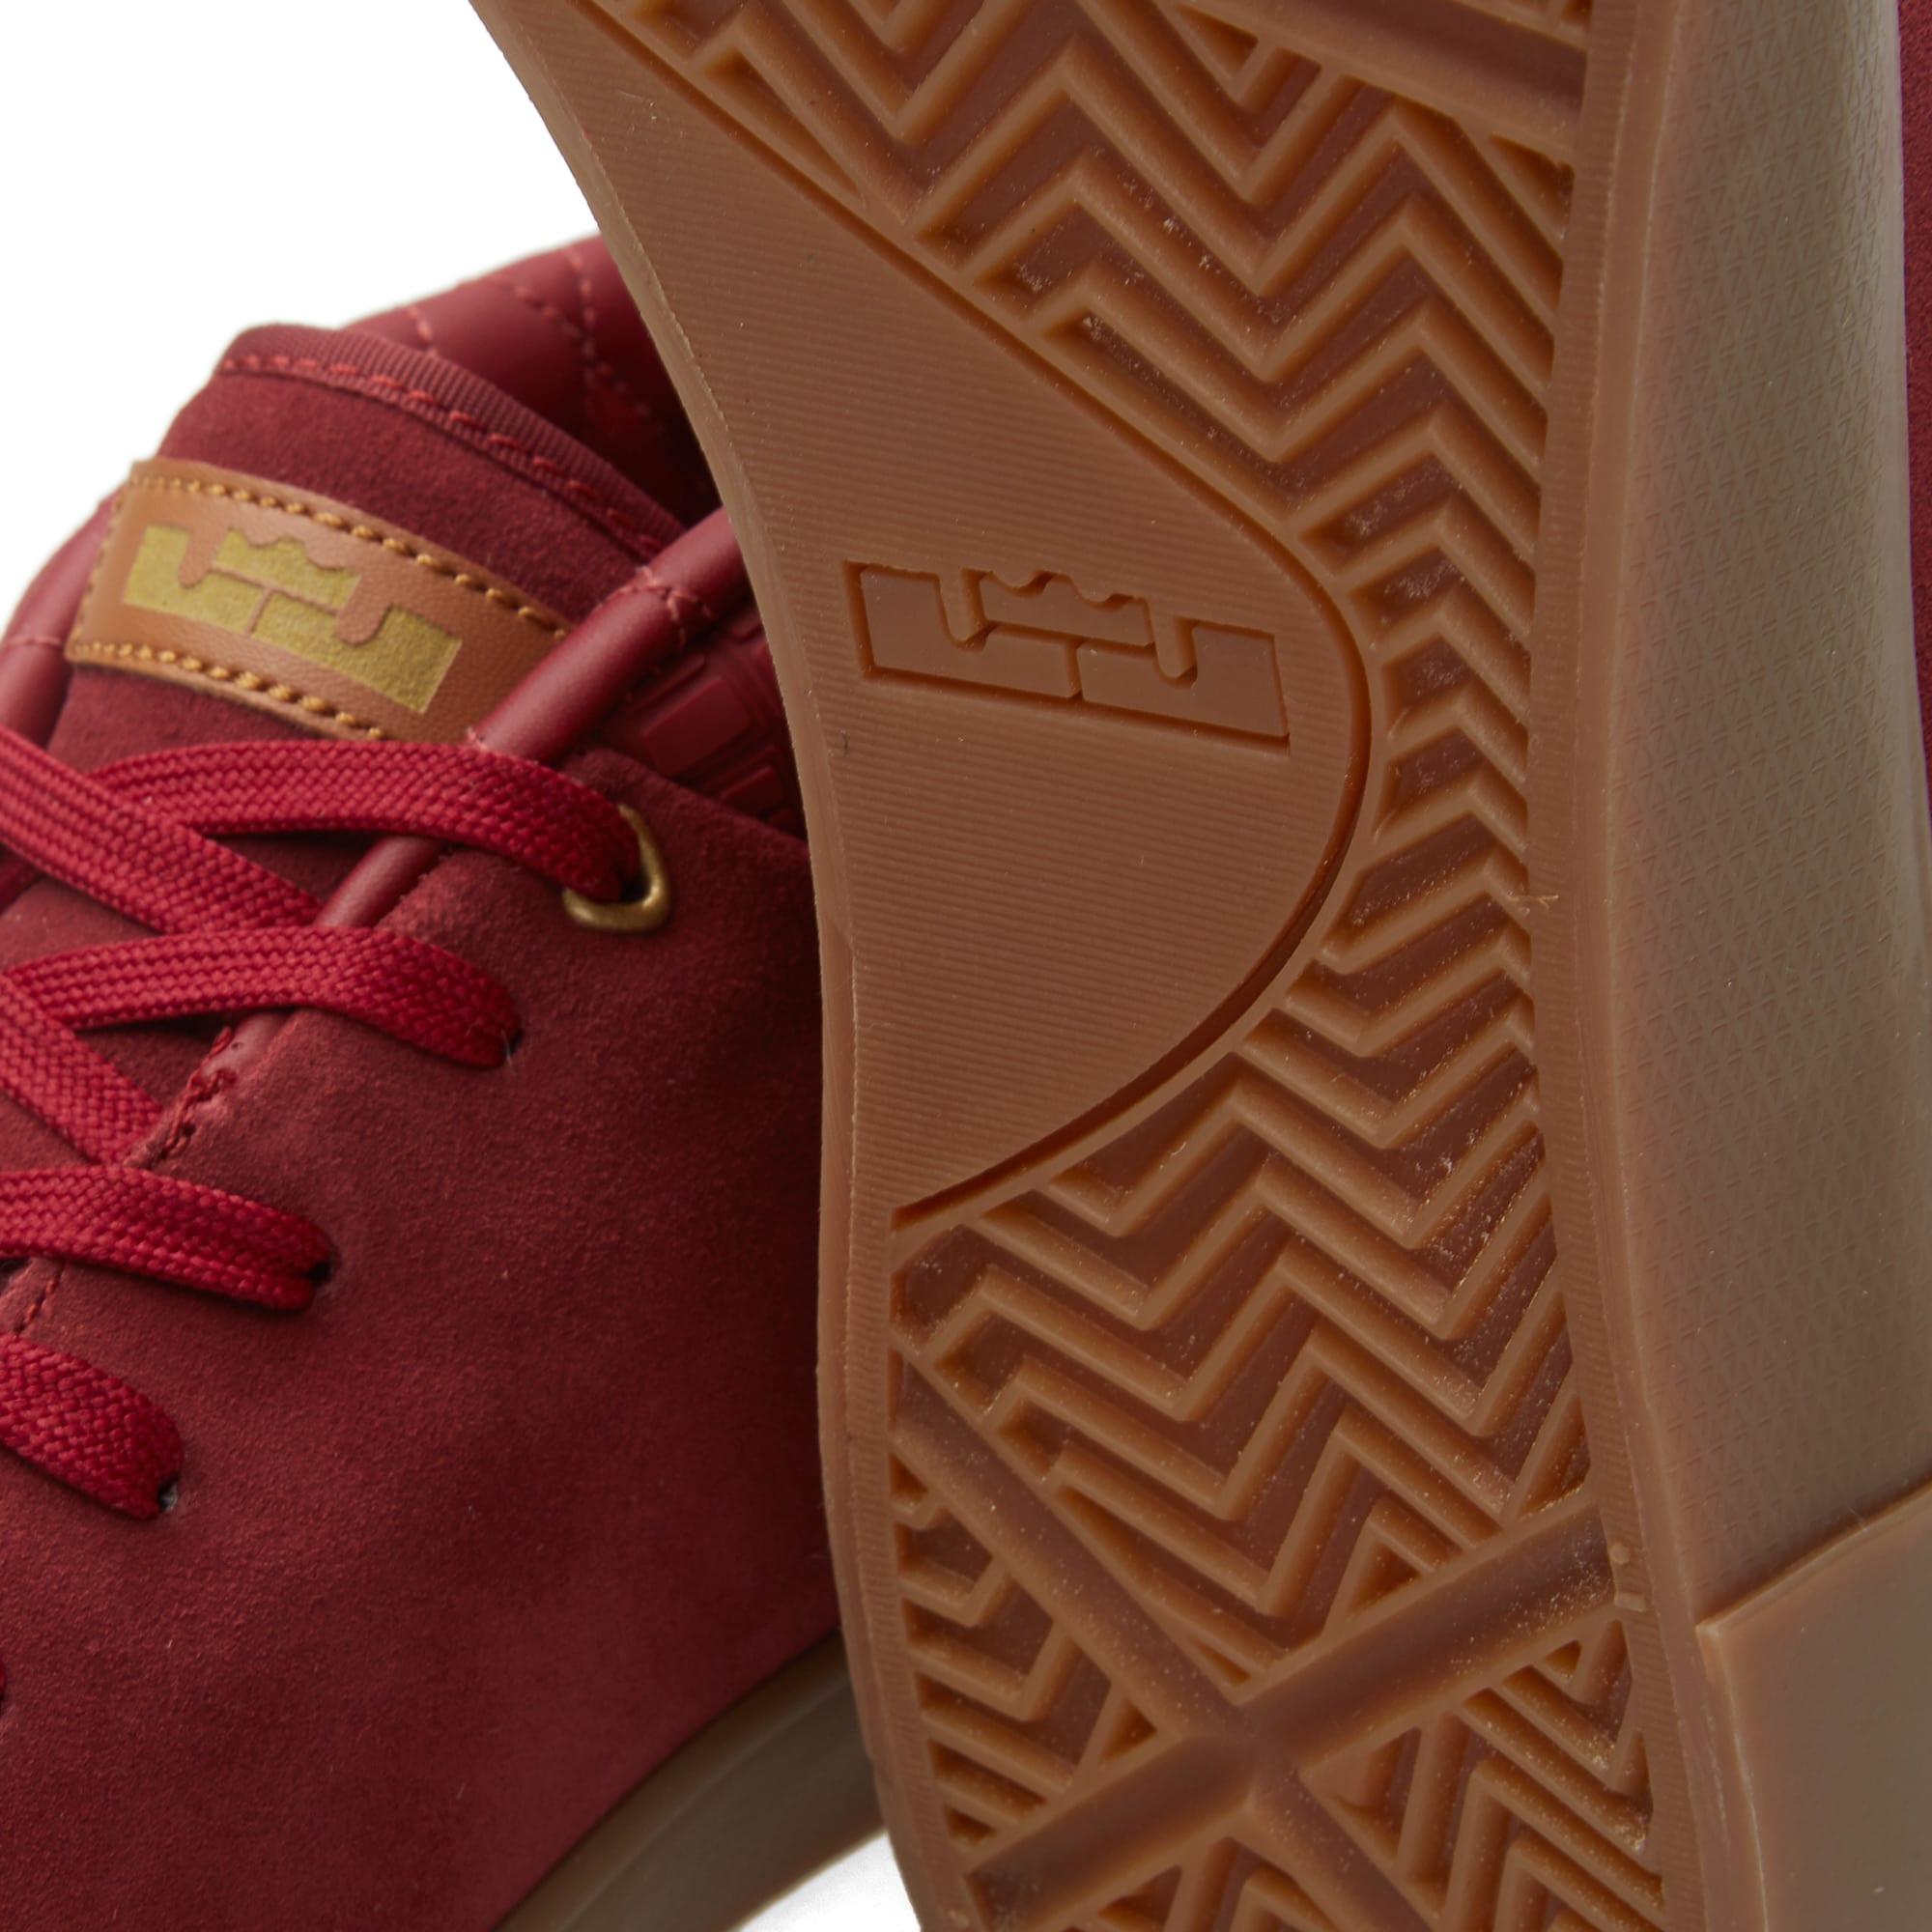 84b8760306a4 Nike Lebron XIII Lifestyle Team Red   Metallic Gold